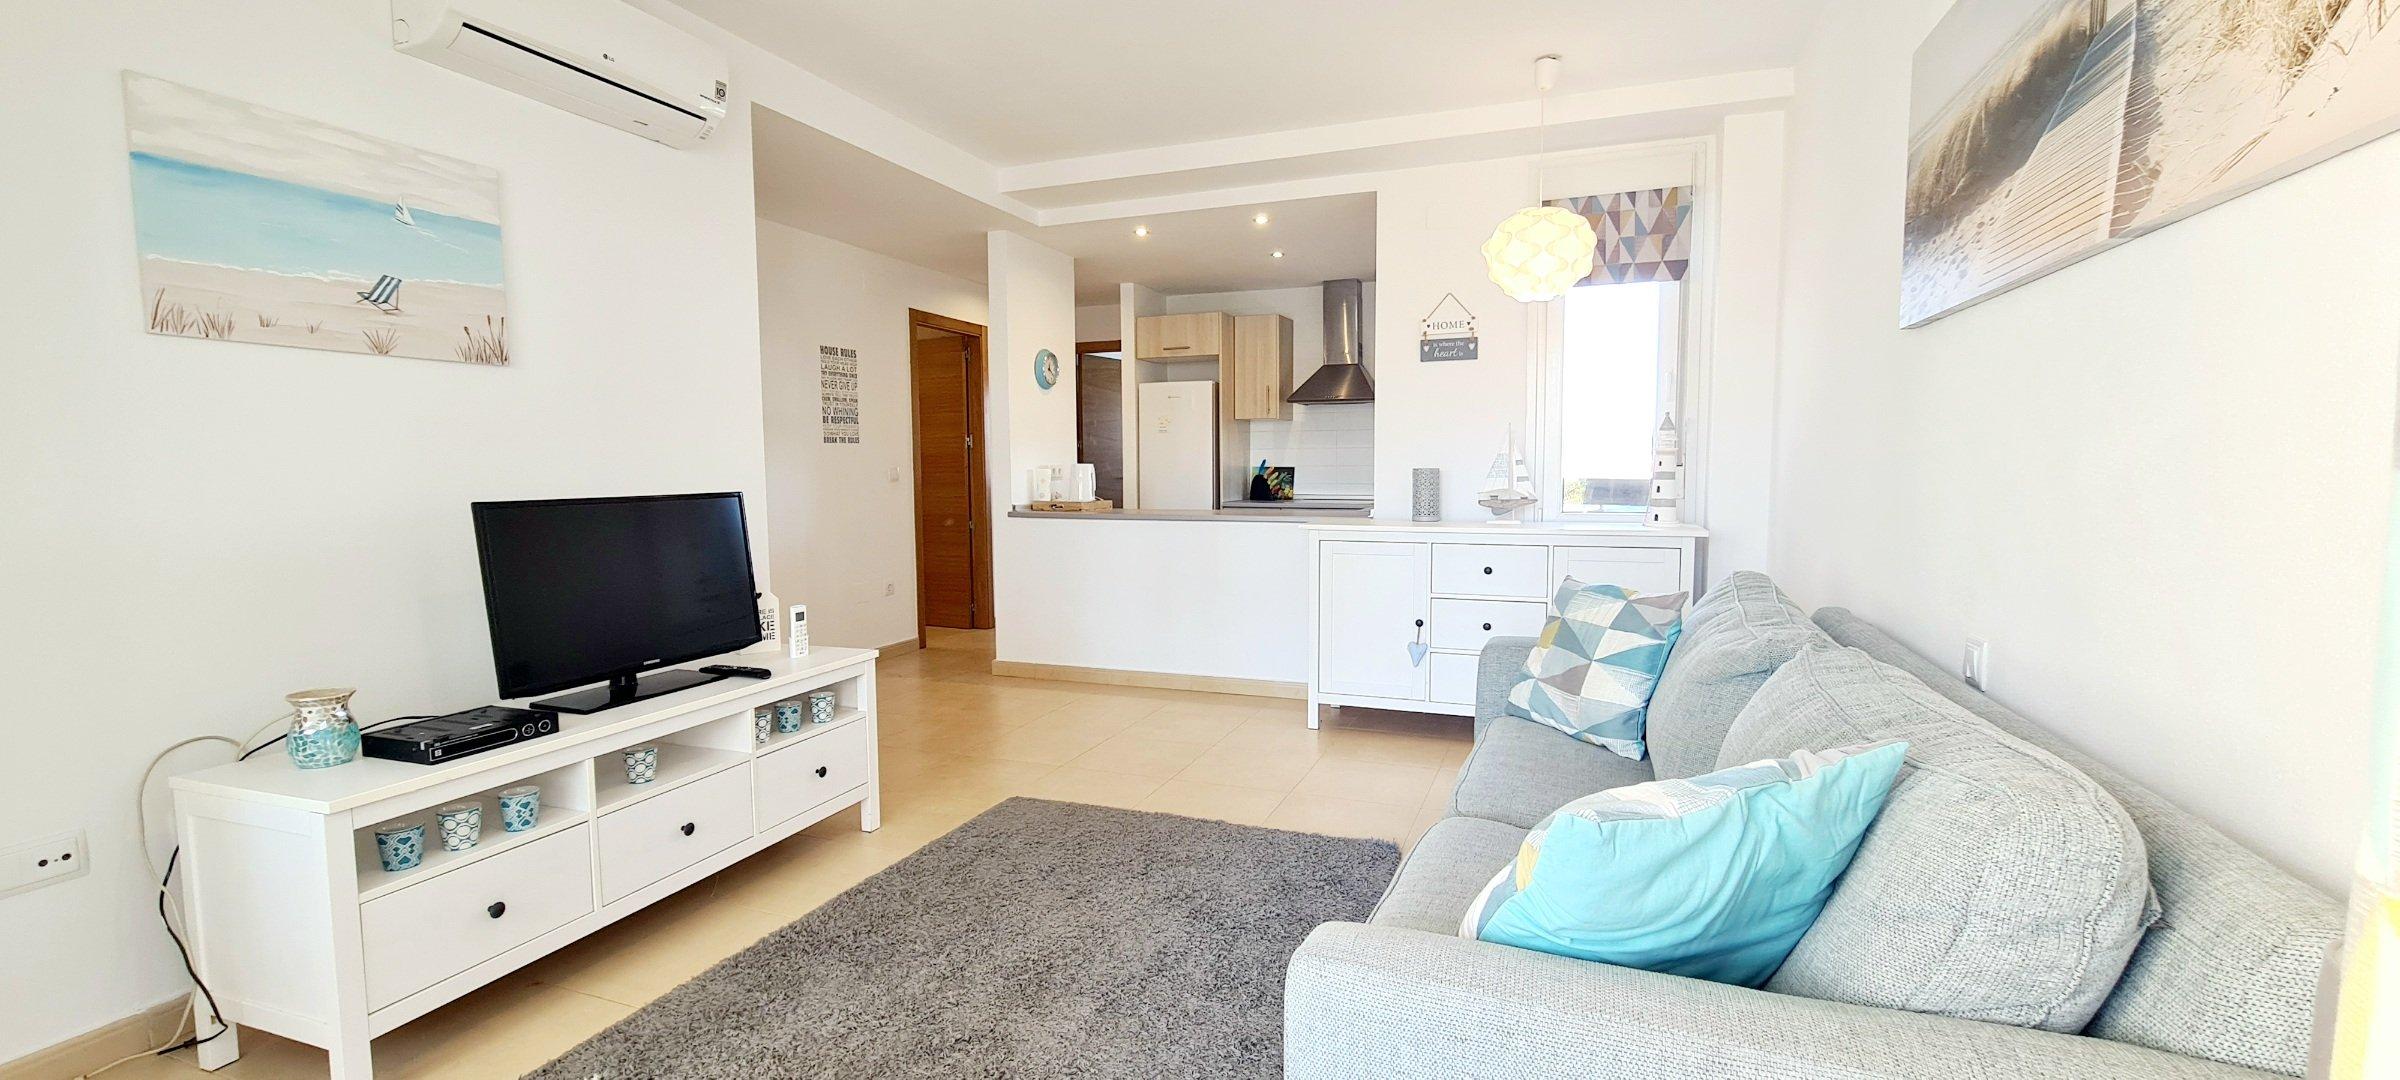 2 Bed 1 Bath – South Facing Ground Floor Apartment – Terrazas De La Torre Golf Resort – Murcia